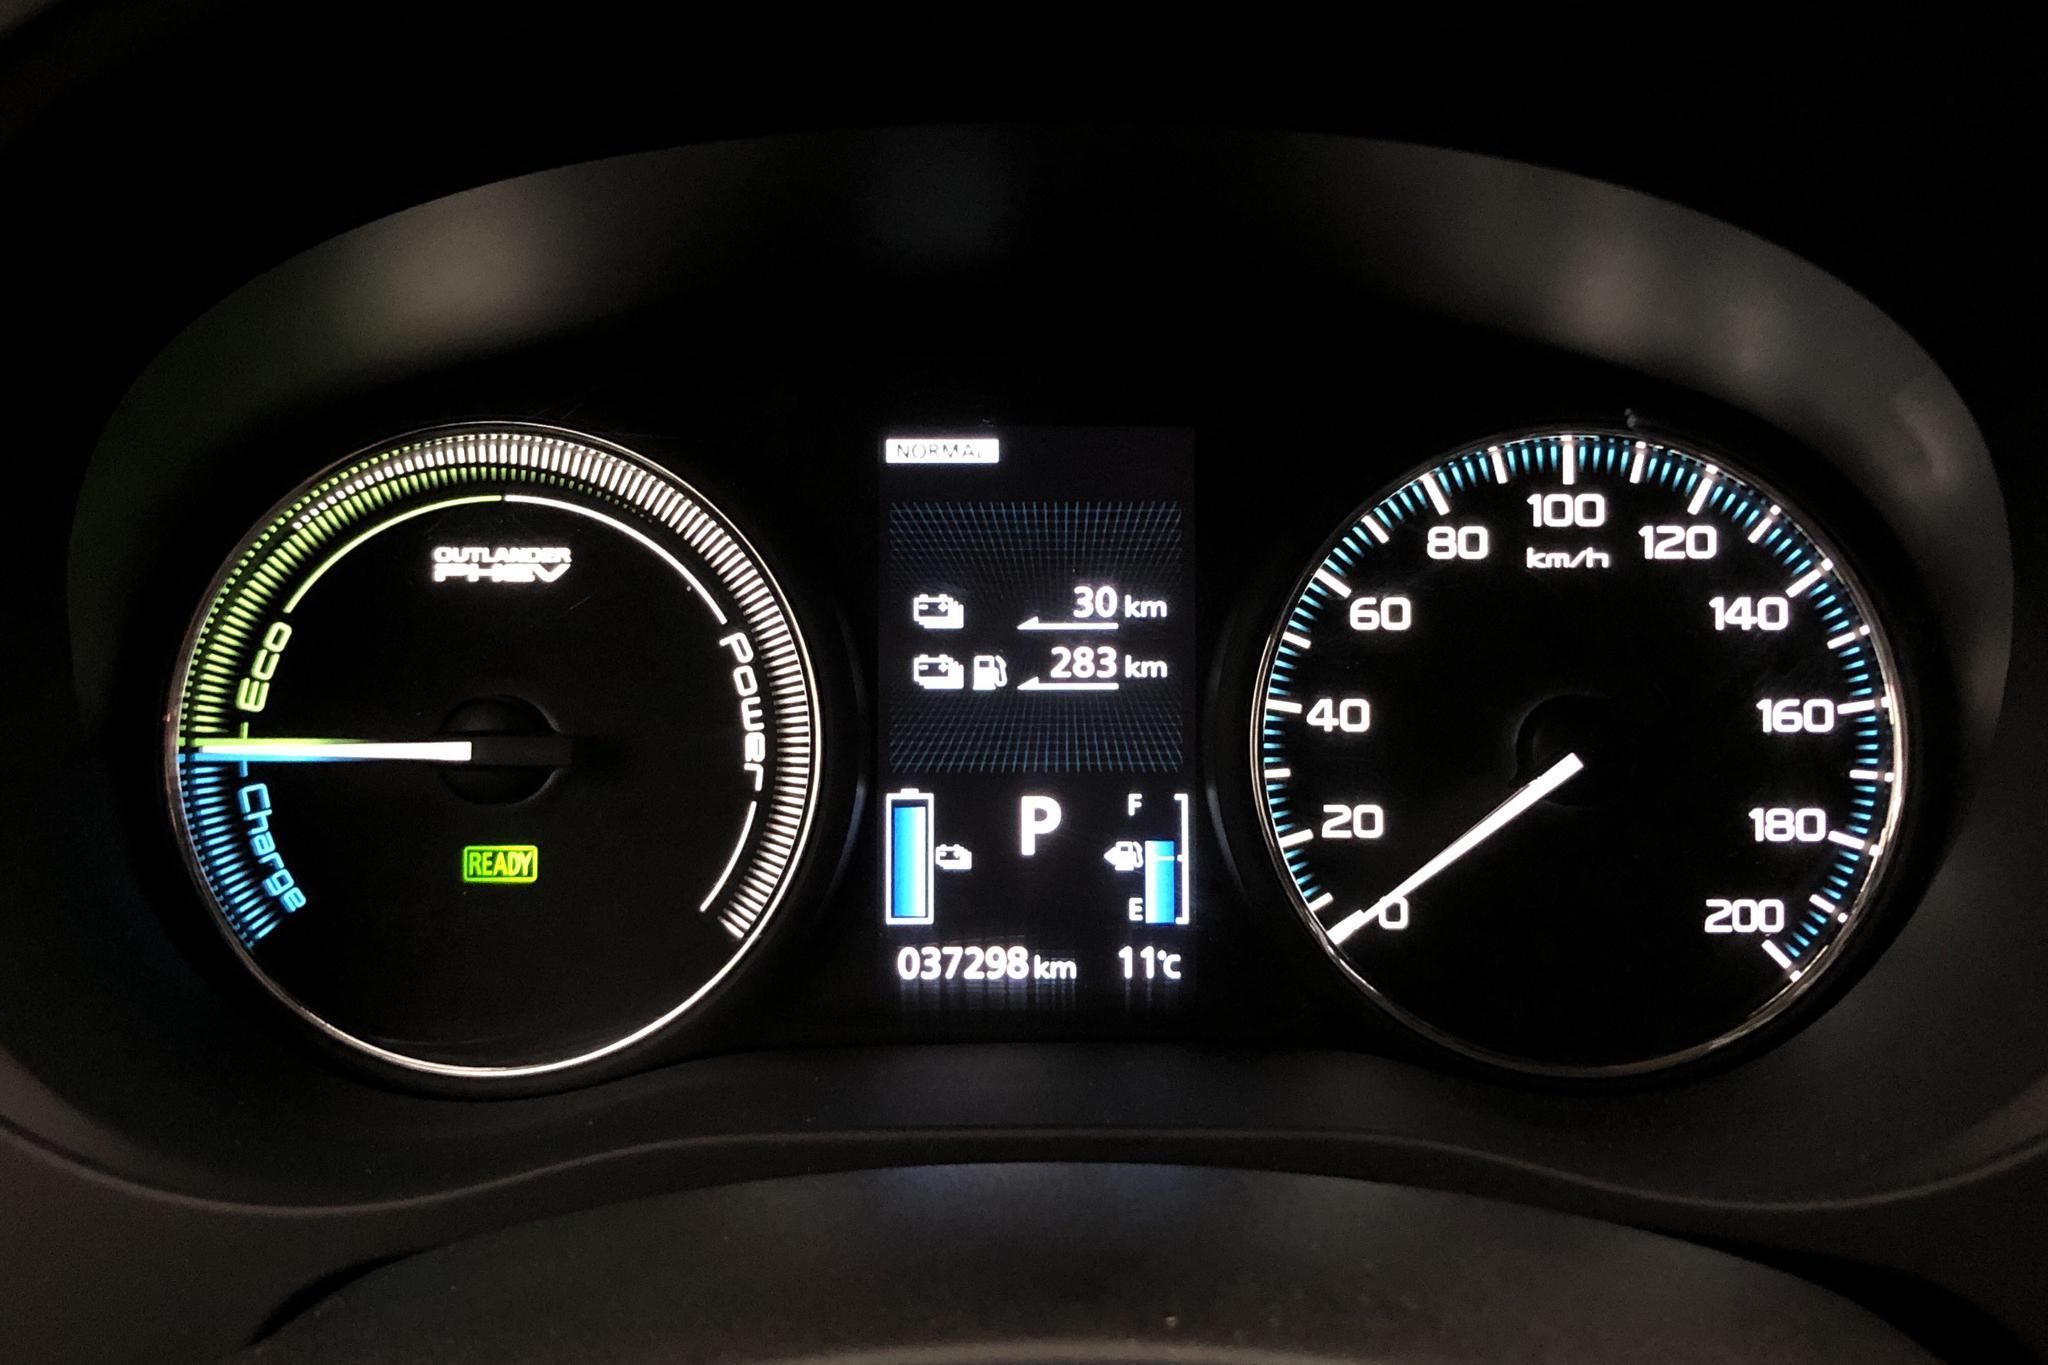 Mitsubishi Outlander 2.0 Plug-in Hybrid 4WD (121hk) - 3 729 mil - Automat - vit - 2017